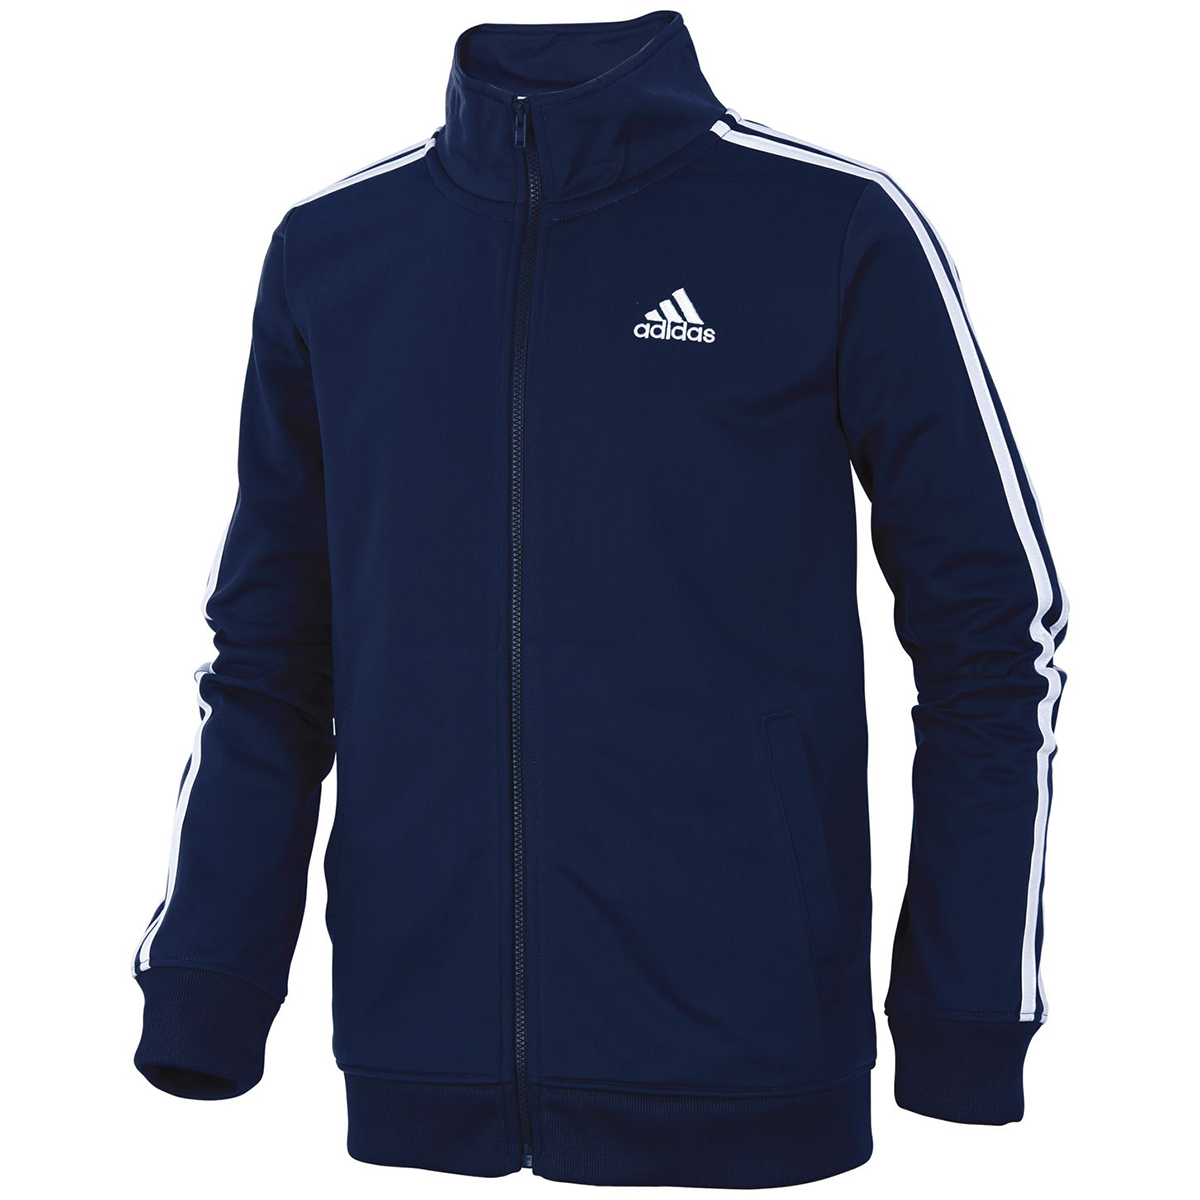 Adidas Big Boys' Iconic Tricot Track Jacket - Blue, S